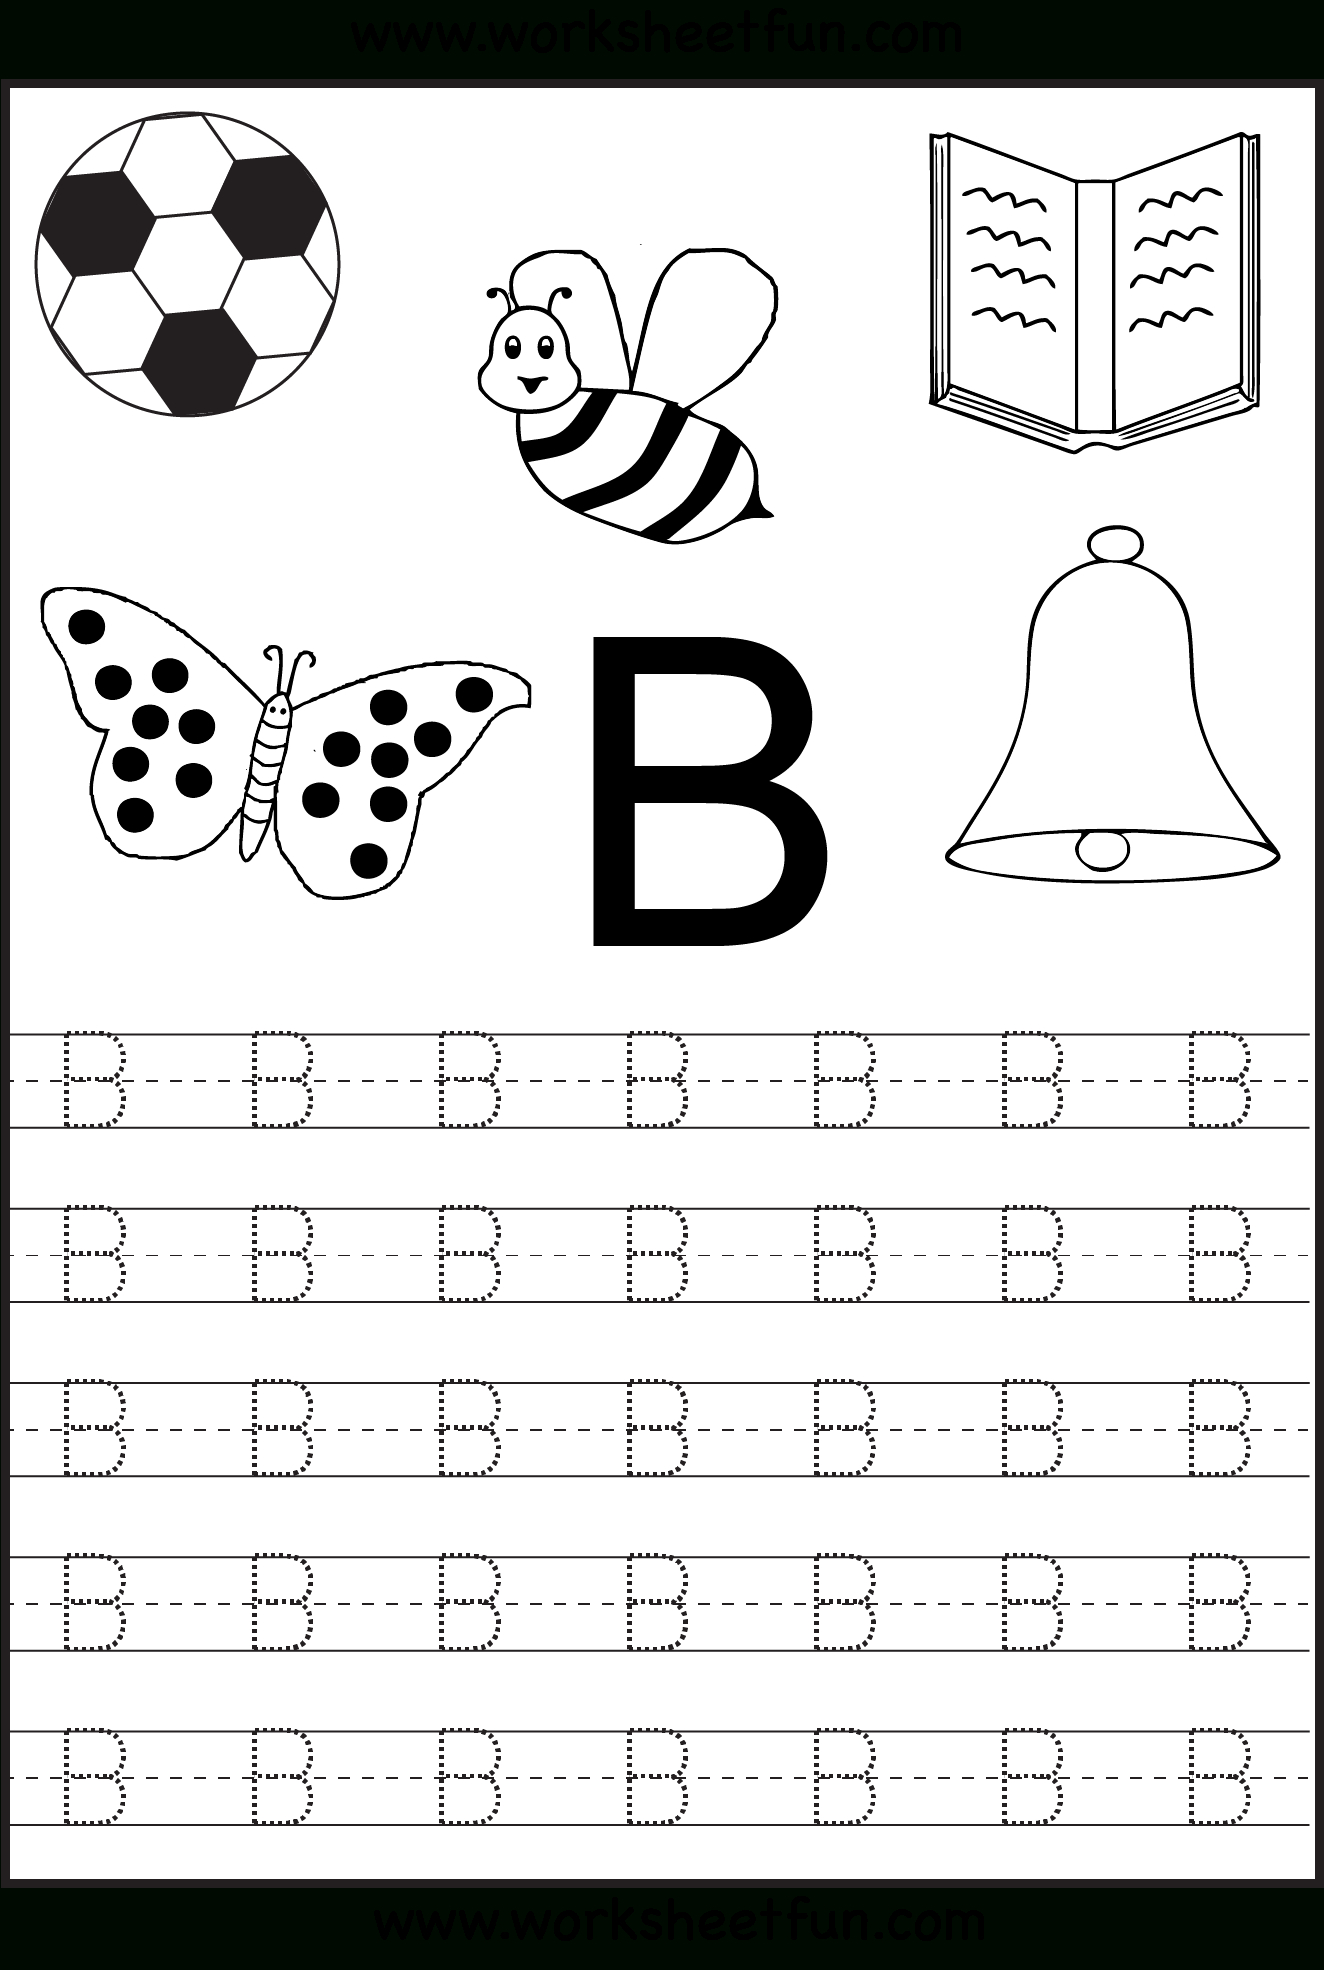 Free Printable Letter Tracing Worksheets For Kindergarten – 26 - Free Printable Alphabet Letters